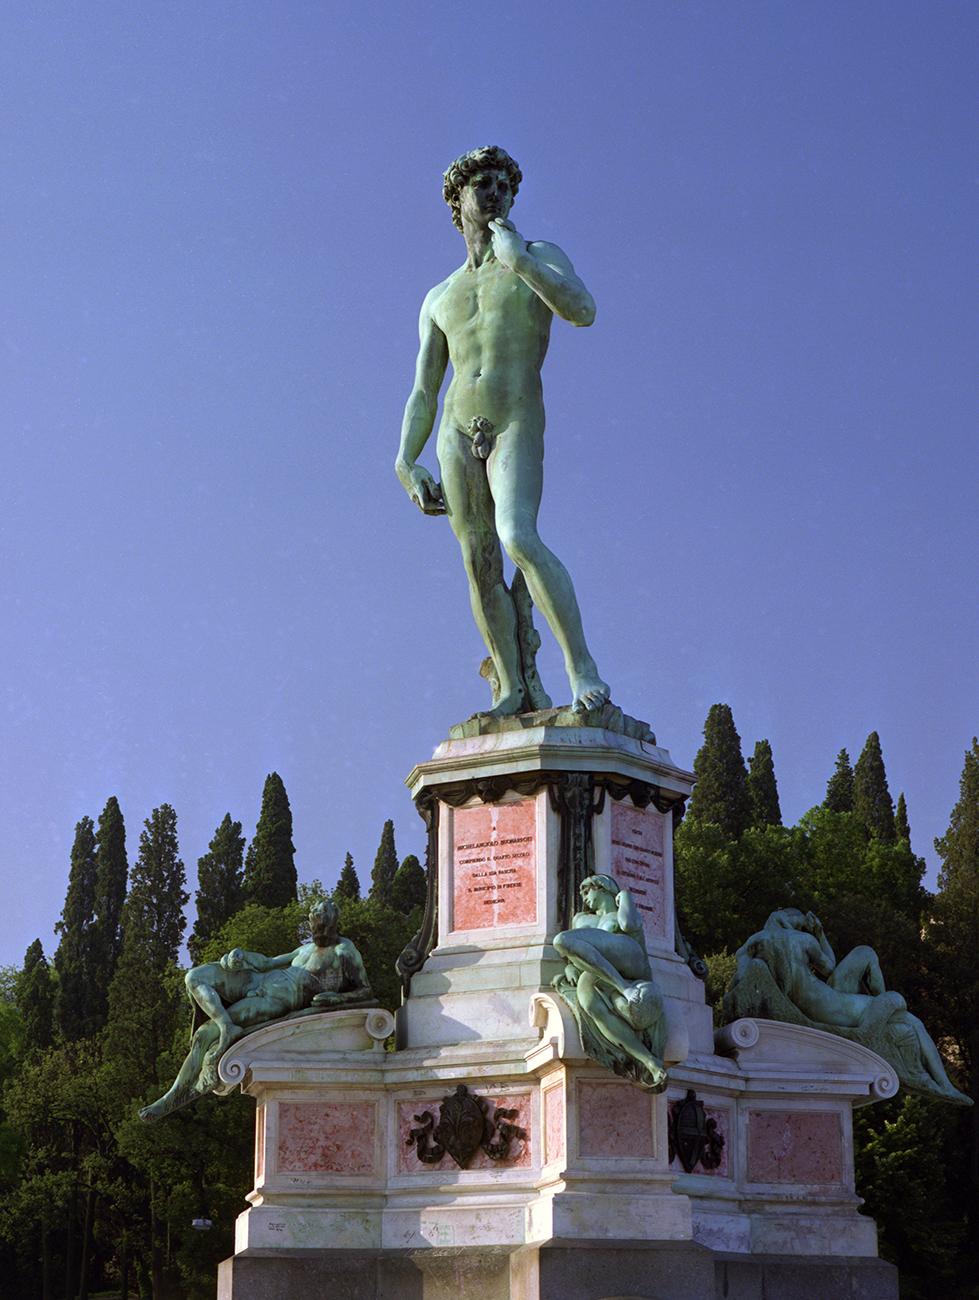 David Presides over Florence